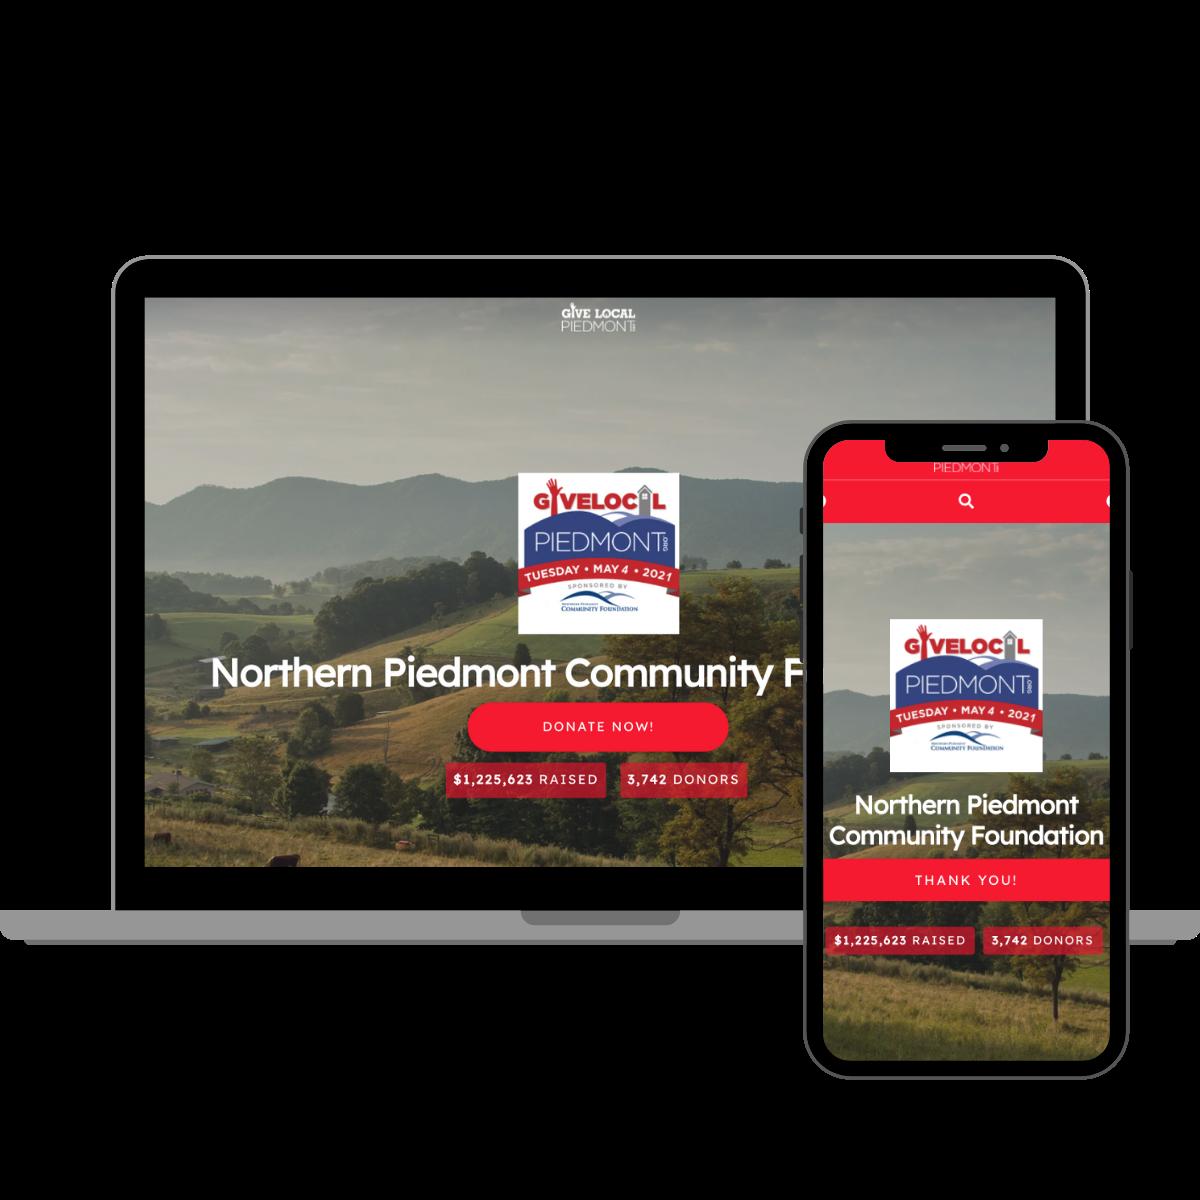 data migration - Give Local Piedmont website on desktop and mobile